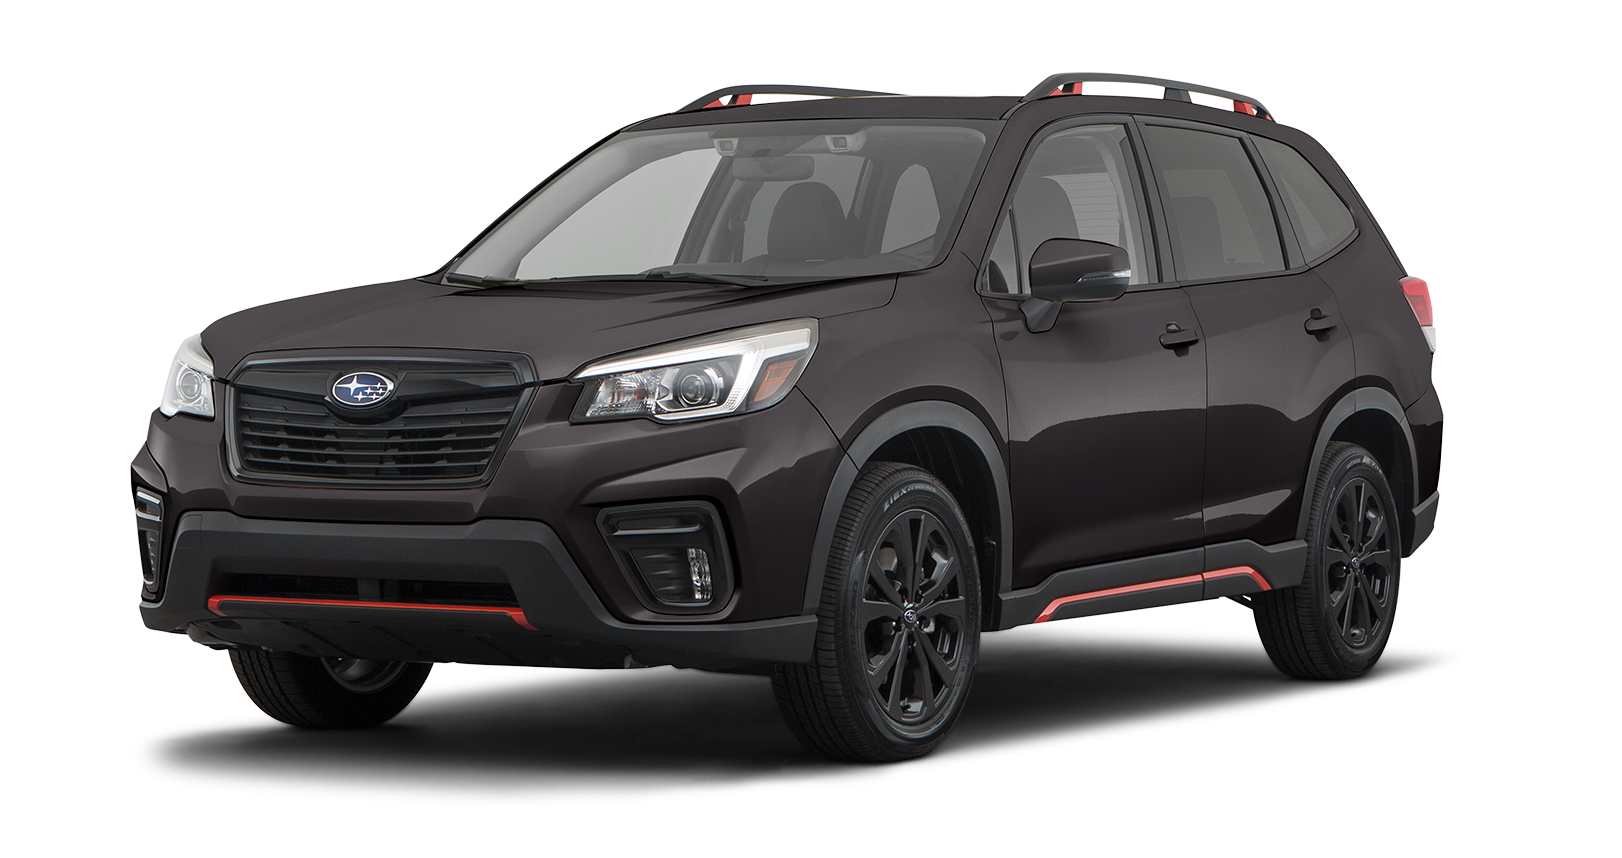 2019 Subaru Models Charleston Sc